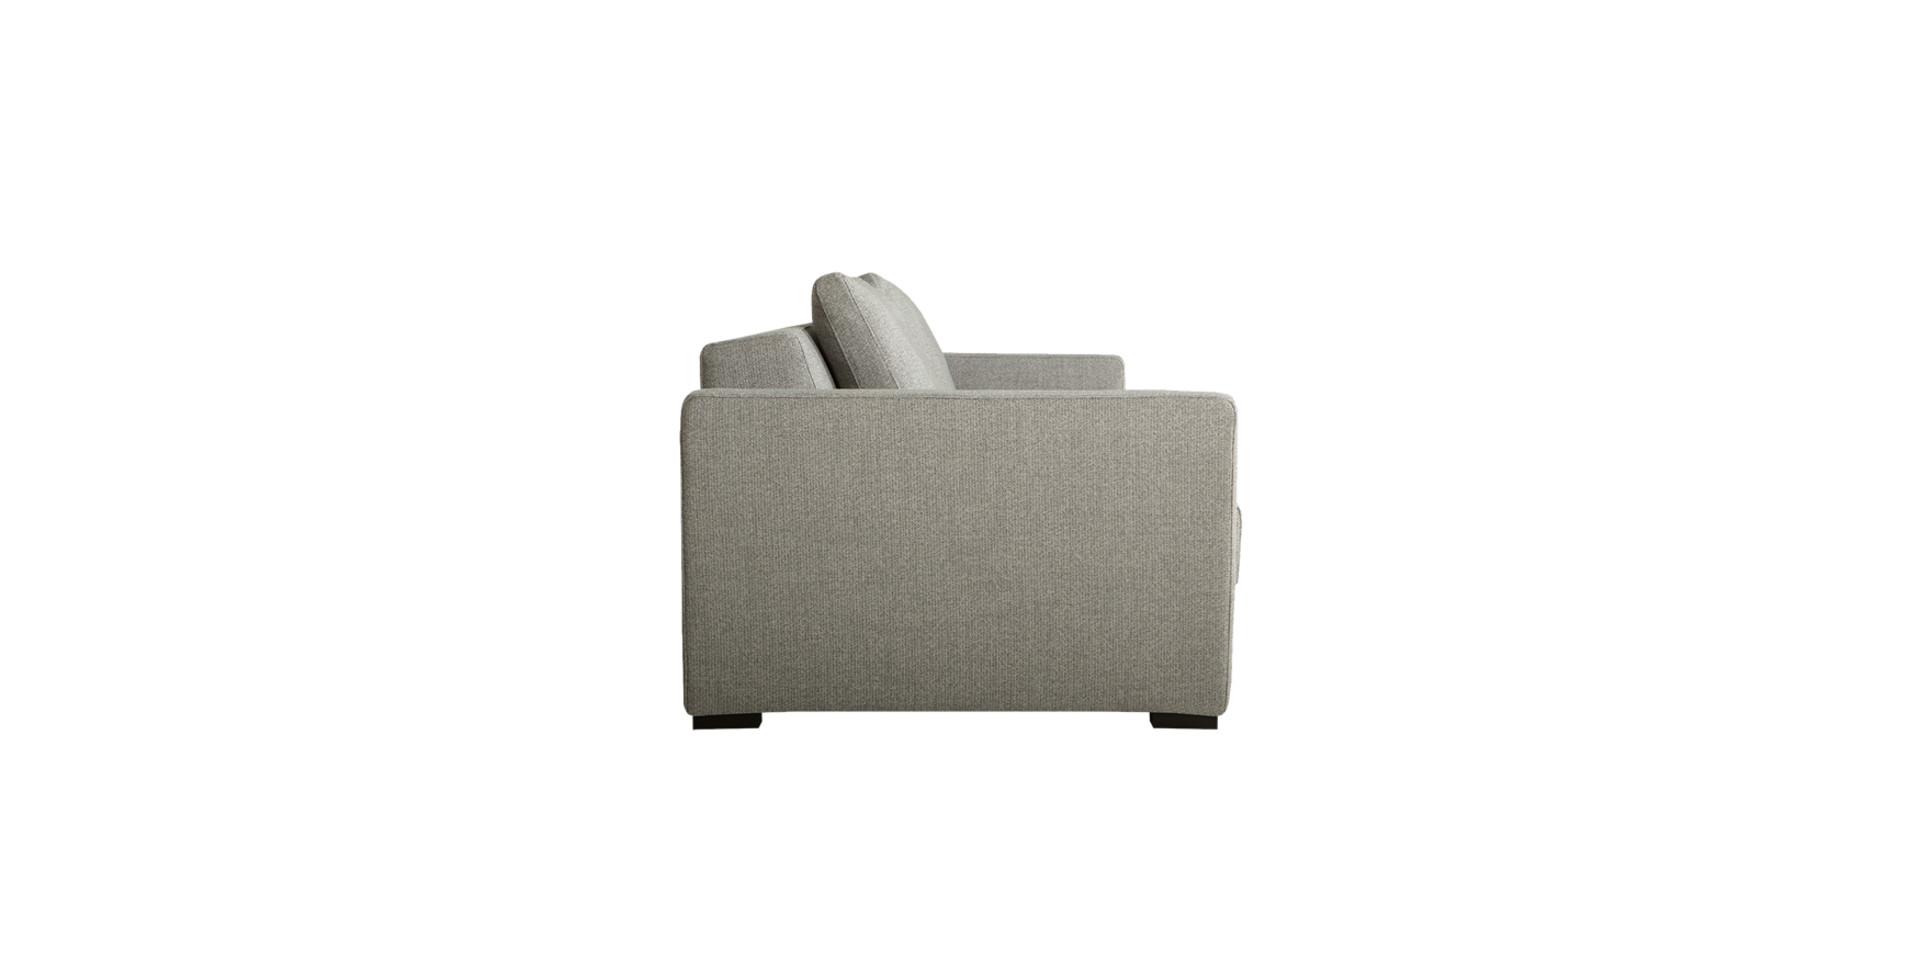 sits-puk-canape-convertible-sofa_bed_origin51_light_grey_3